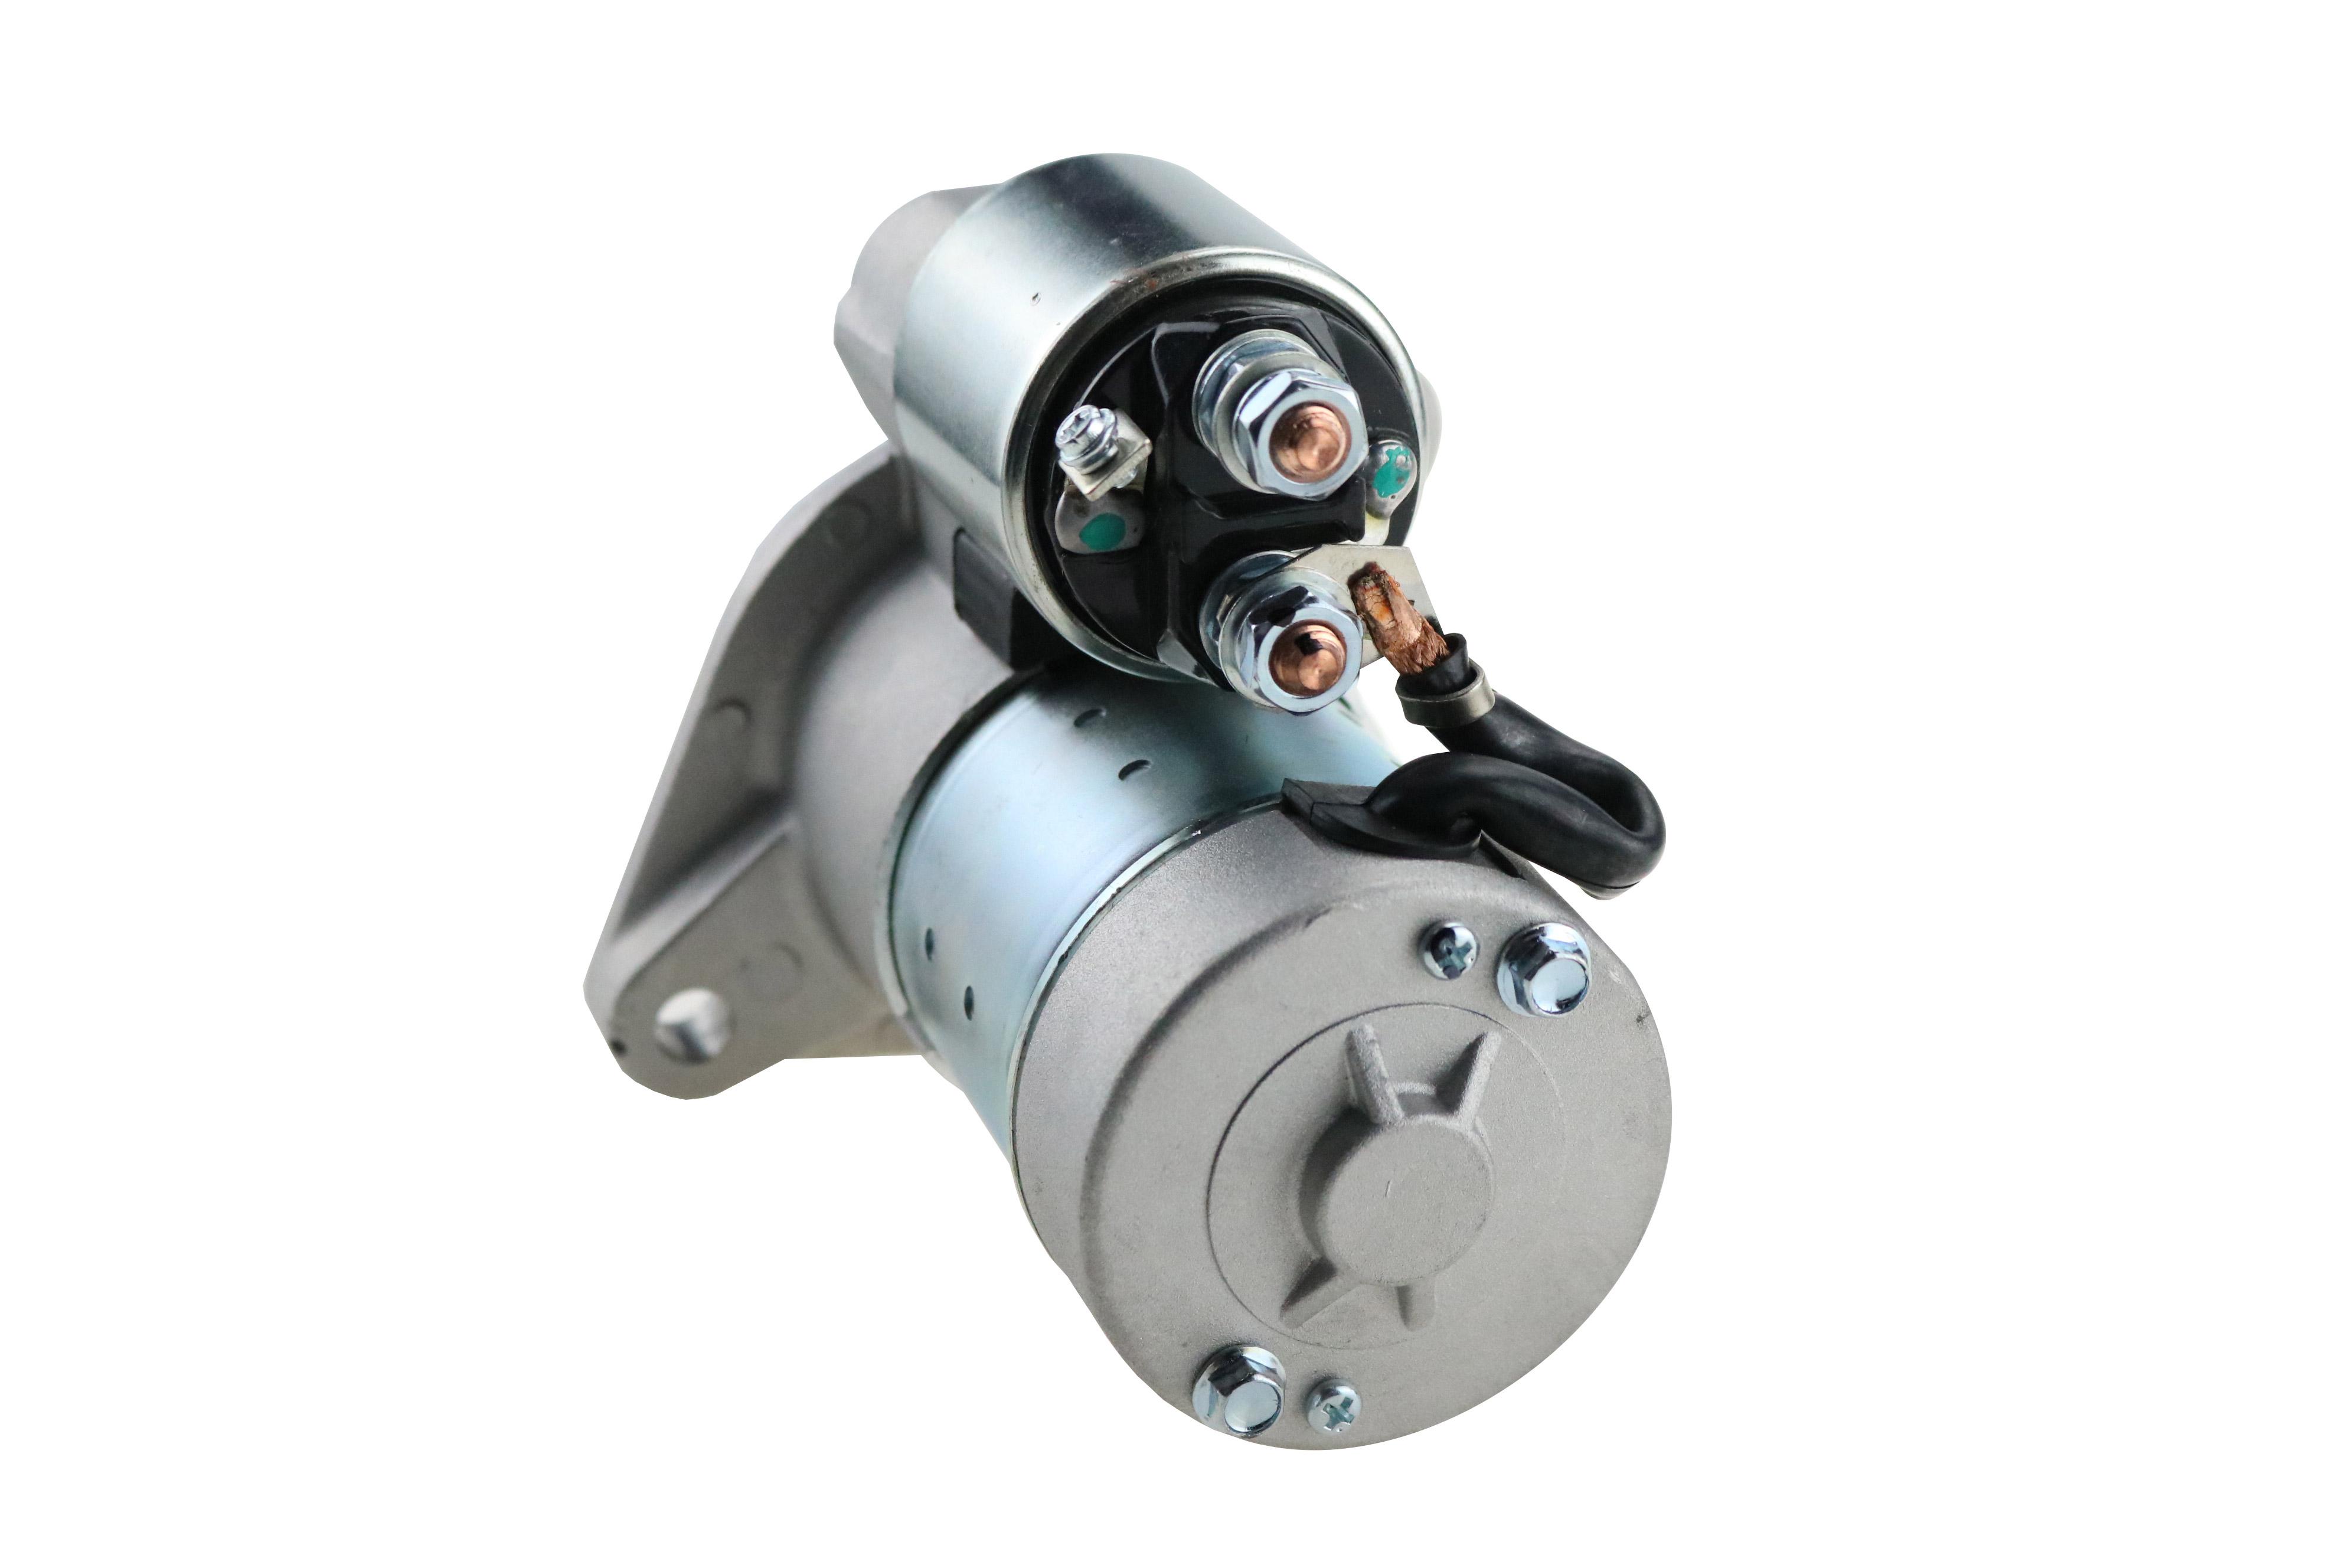 Van 1.7 CDTI 16V 2004-2009 rotor moteur de démarreur Pour VAUXHALL OPEL ASTRA H